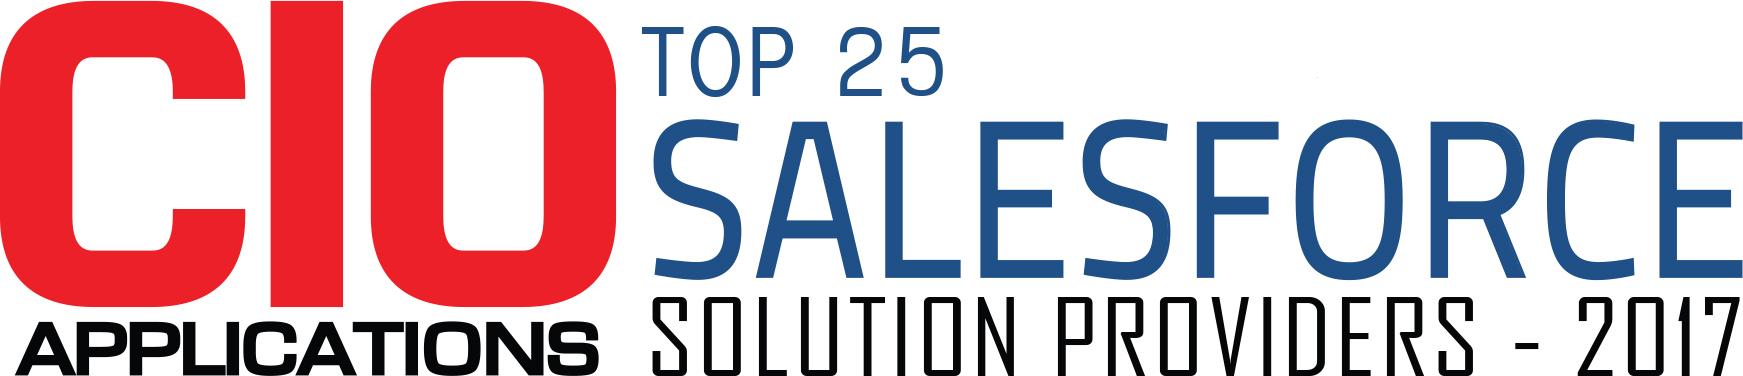 Top 25 Salesforce Solution Companies- 2017